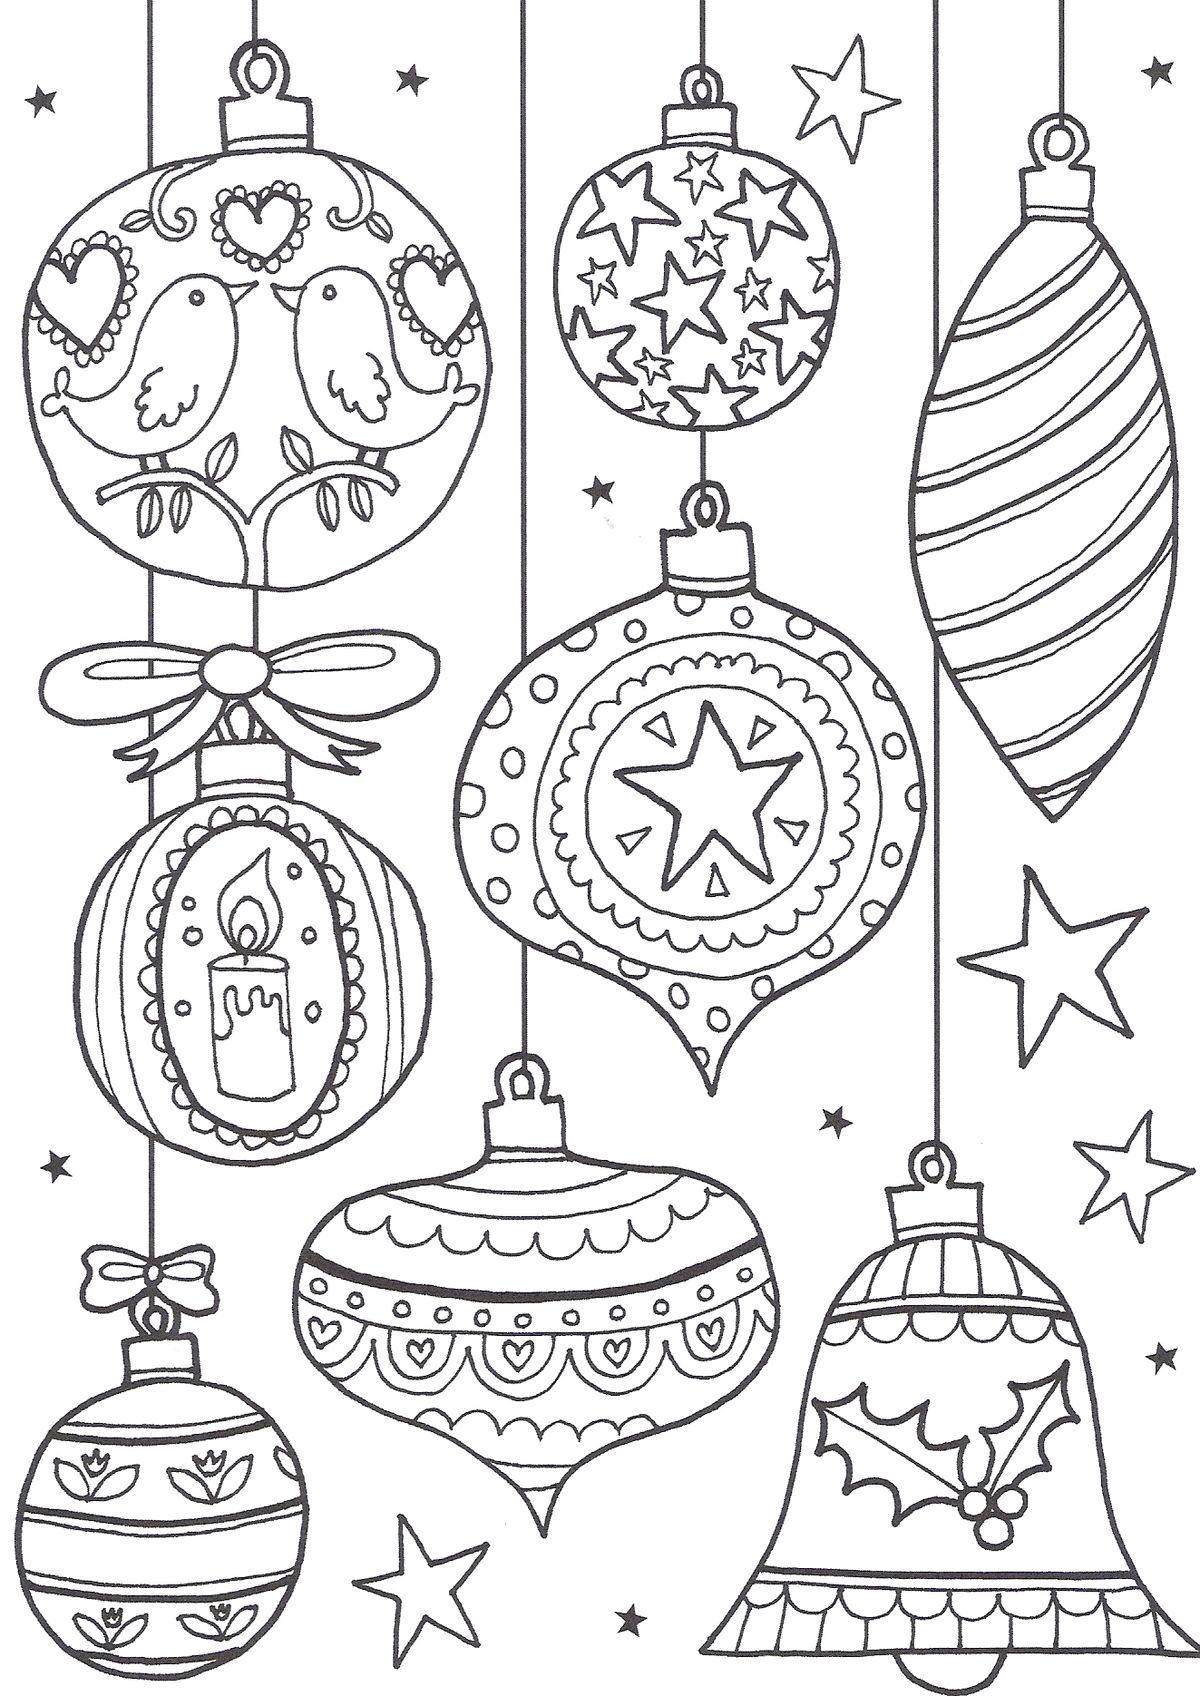 Bolas navidad colorear | Navidad infantil | Pinterest | Doodles ...